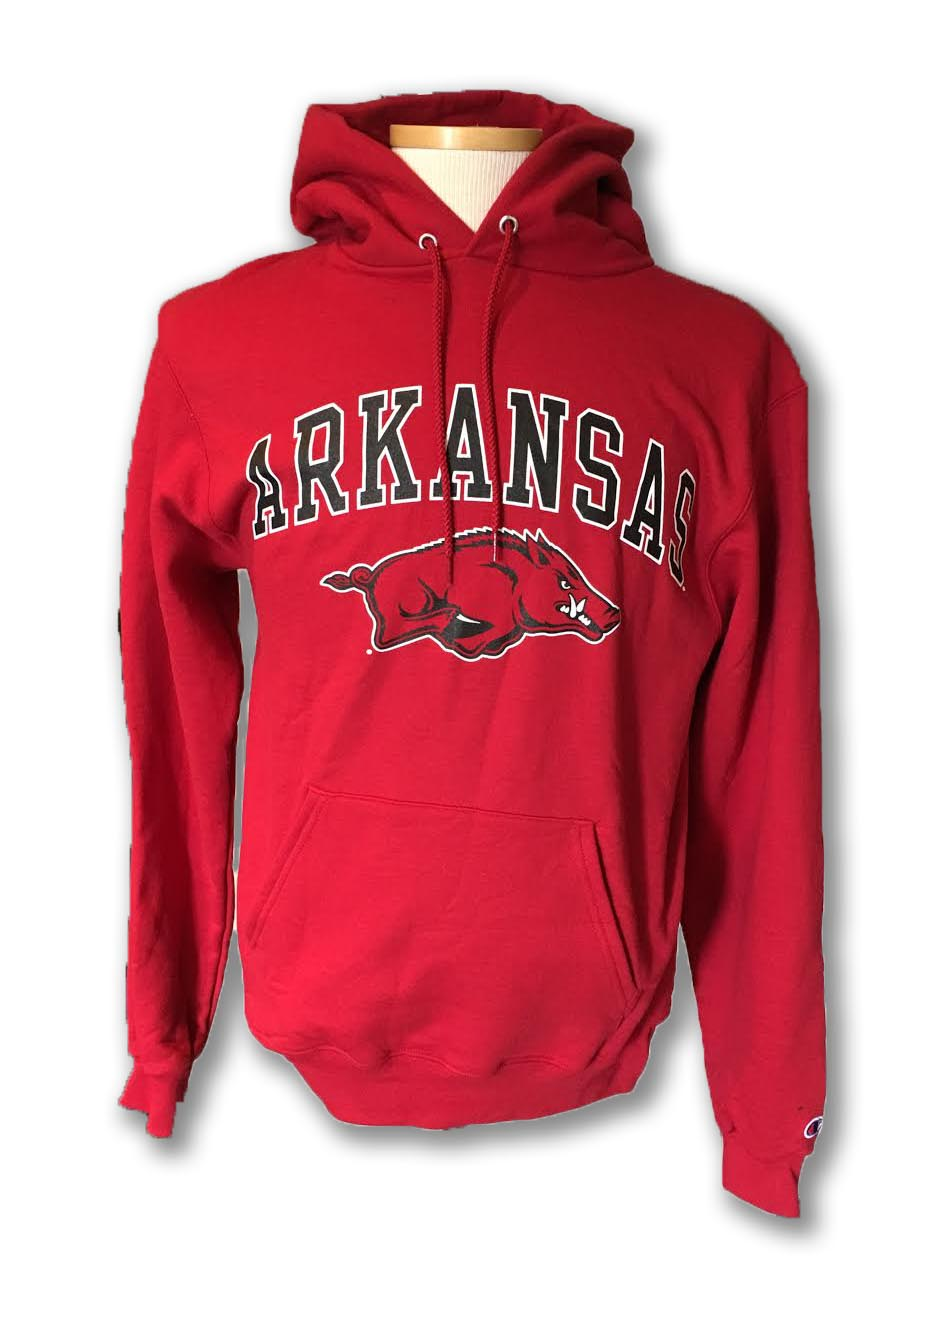 Arkansas Razorback Hoodie